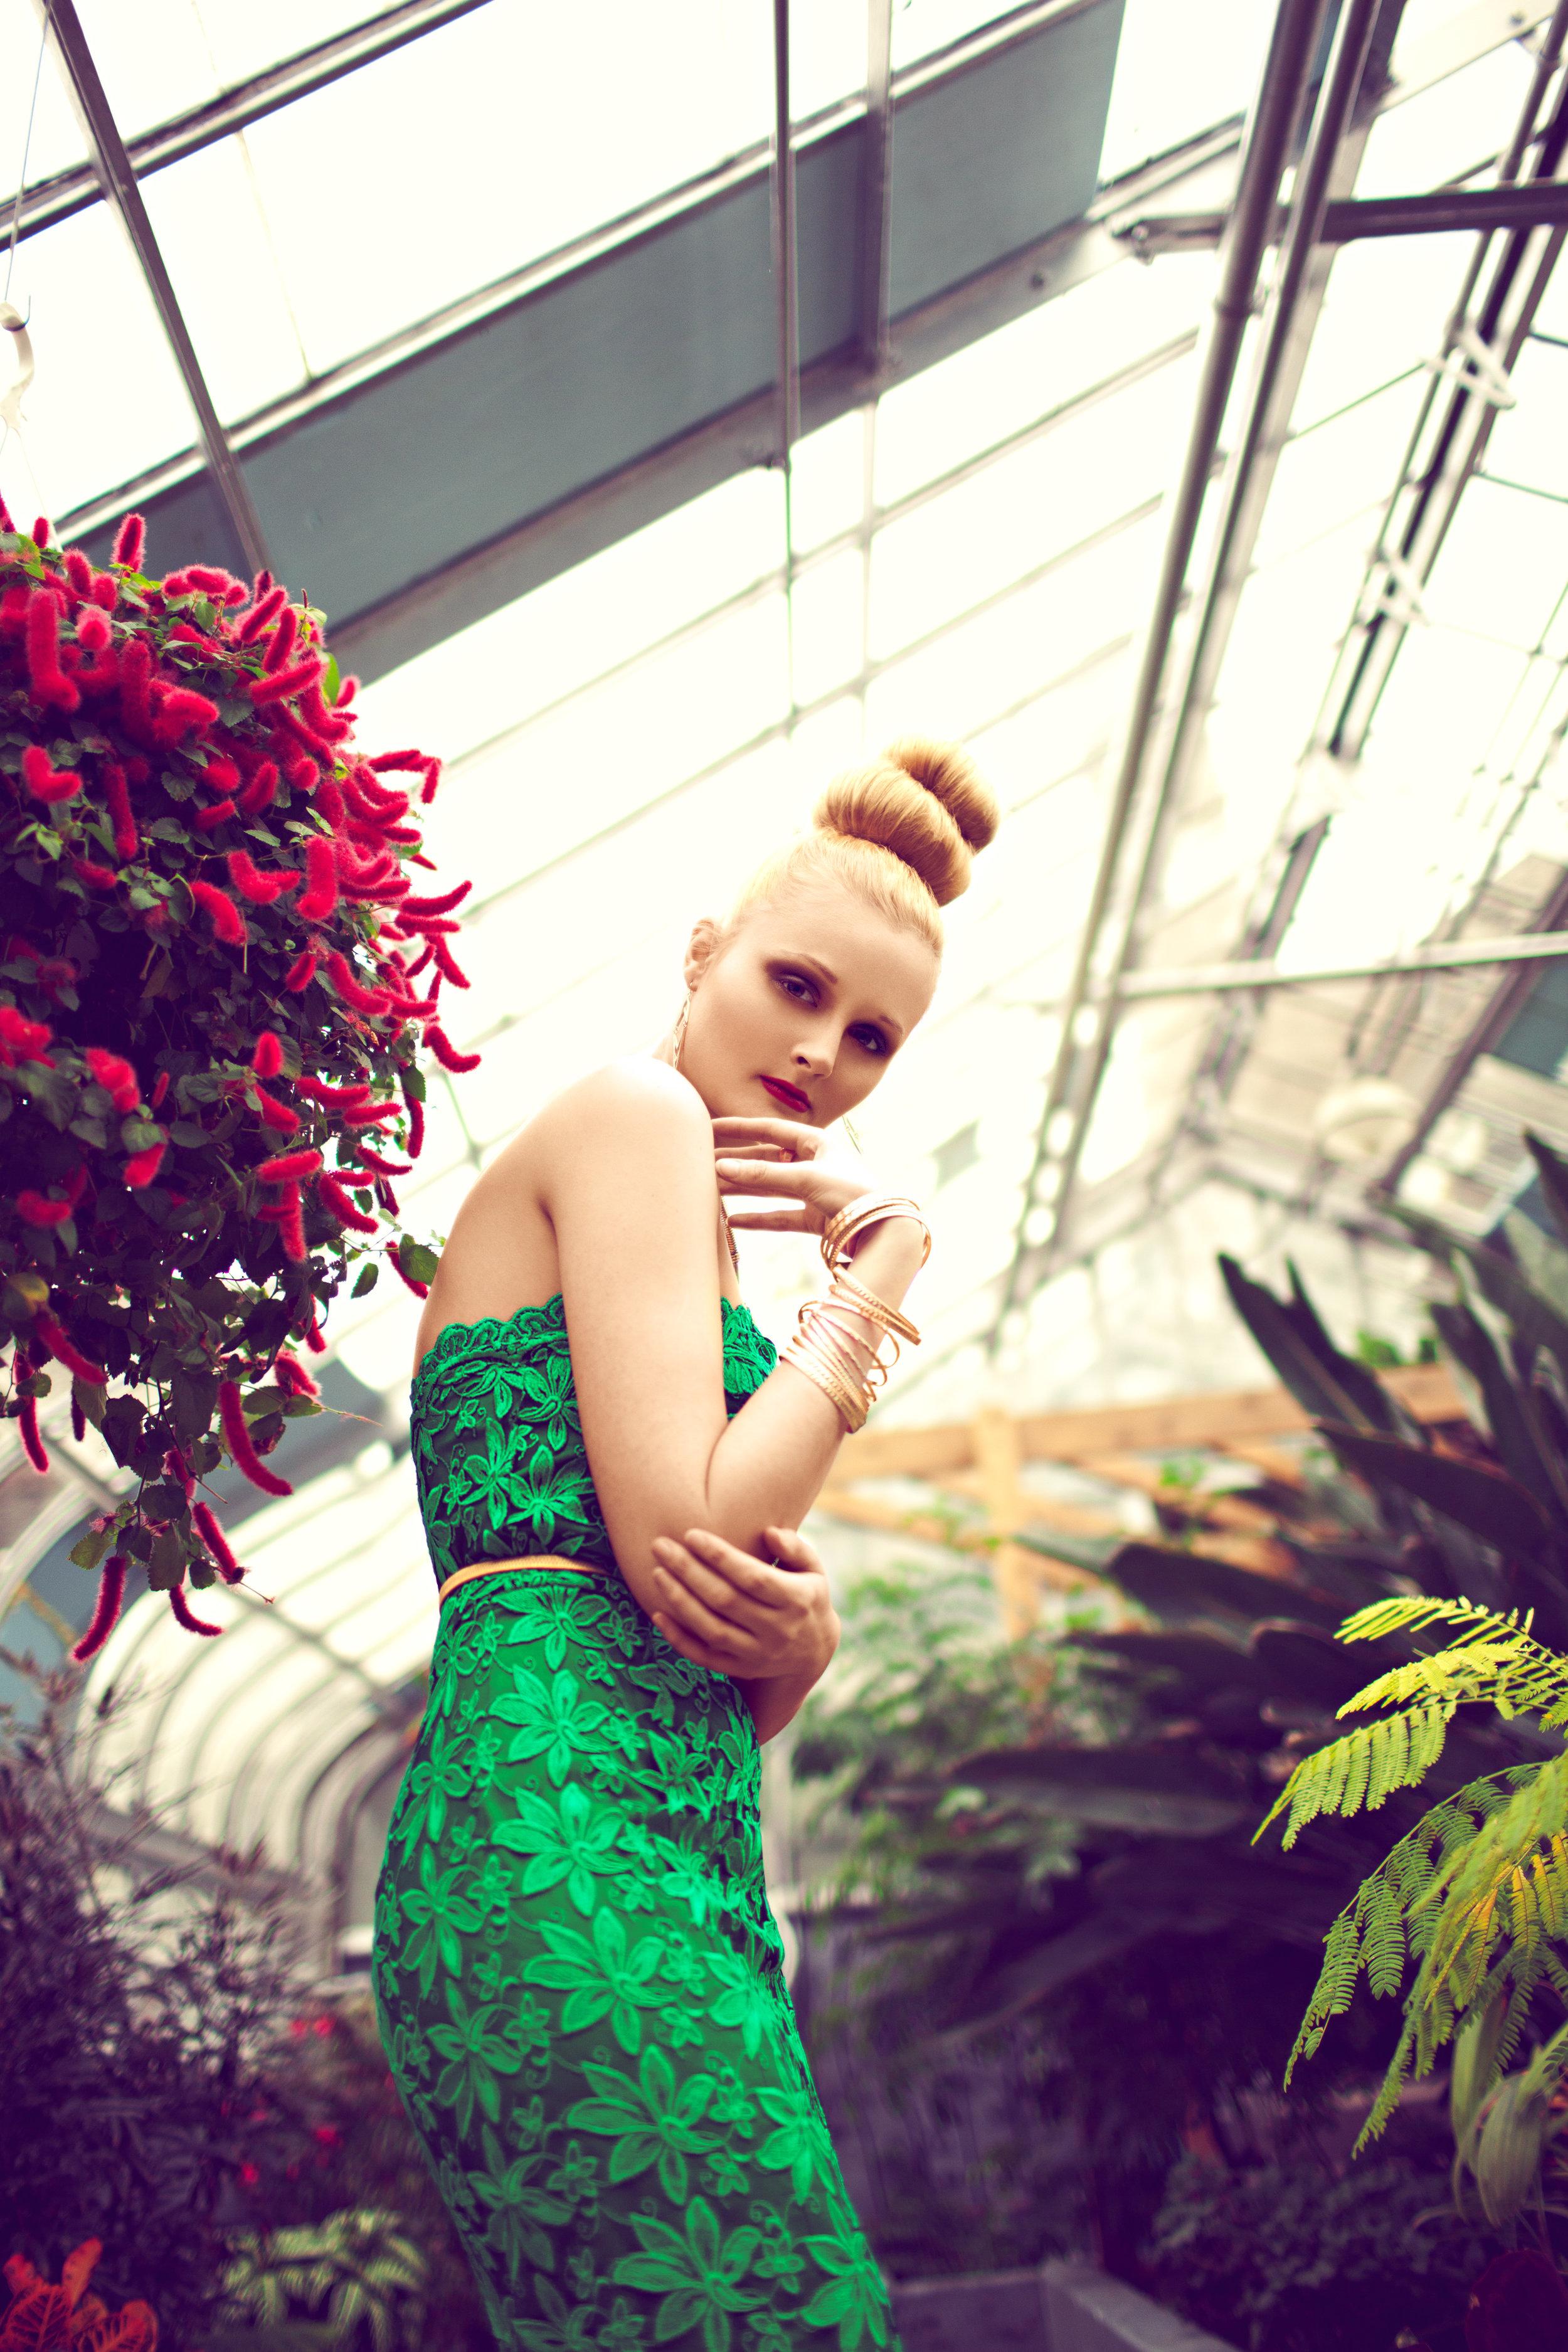 bck-garden-of-elegance-010.jpg